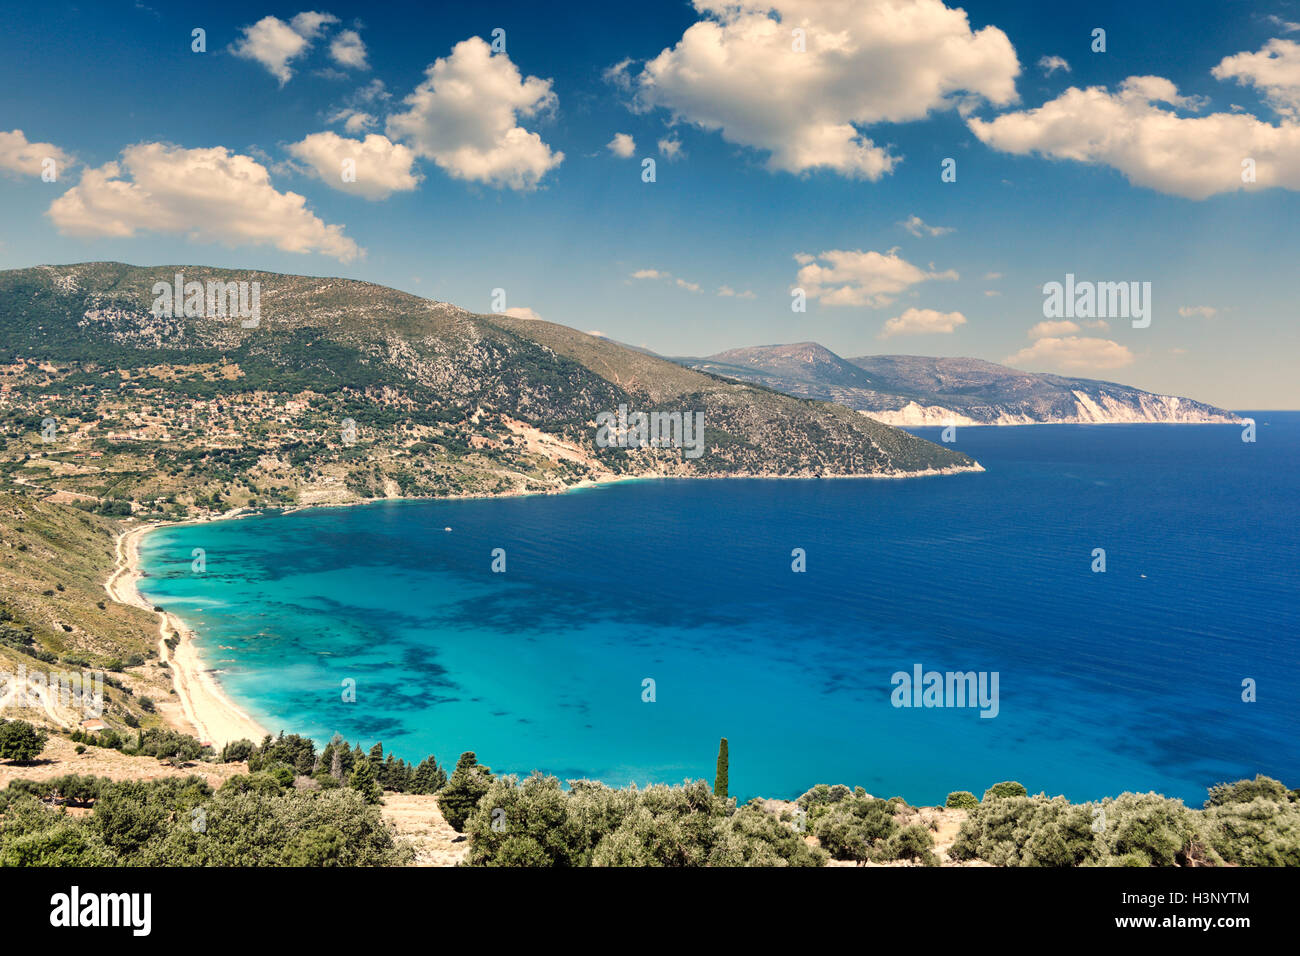 The beach Agia Kyriaki in Kefalonia island, Greece - Stock Image